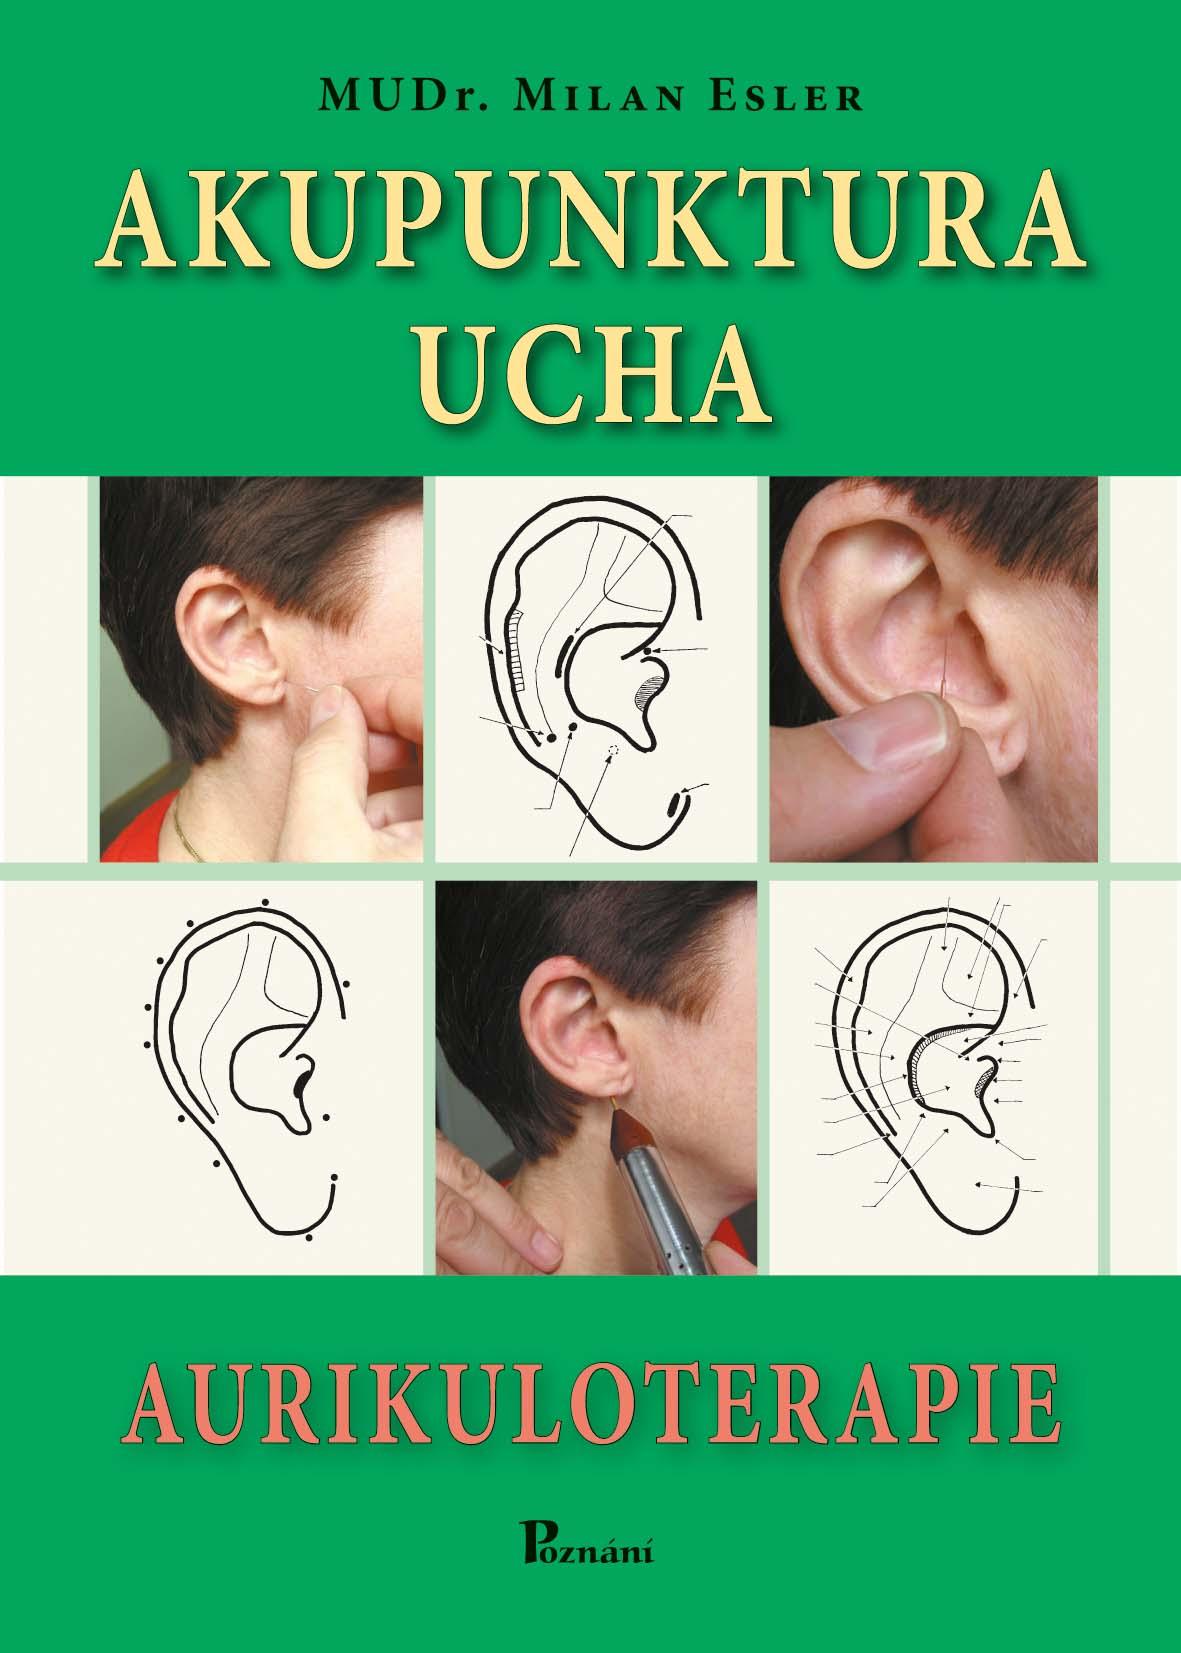 Akupunktura ucha - Aurikuloterapie